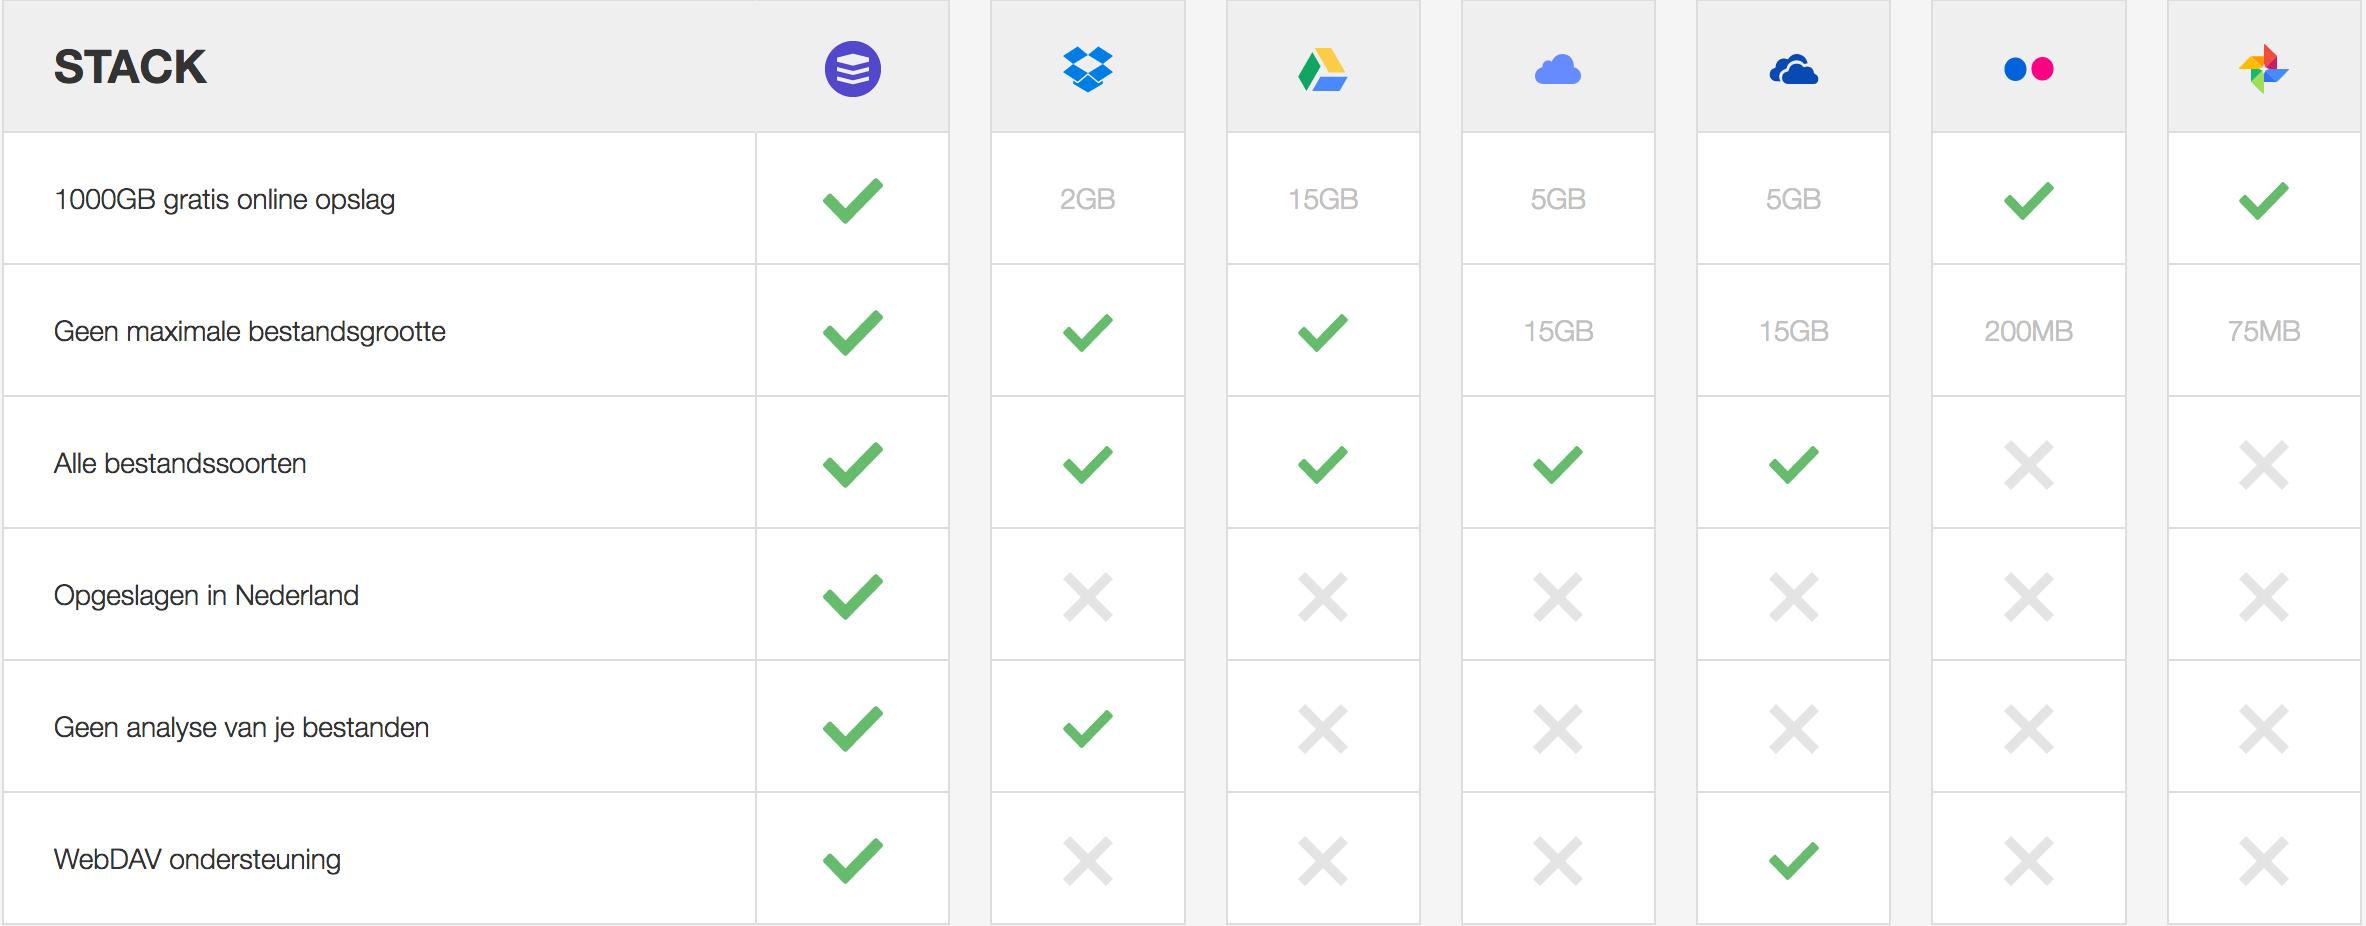 stack cloud storage - Stack Storage: de beste cloud opslag van dit moment?